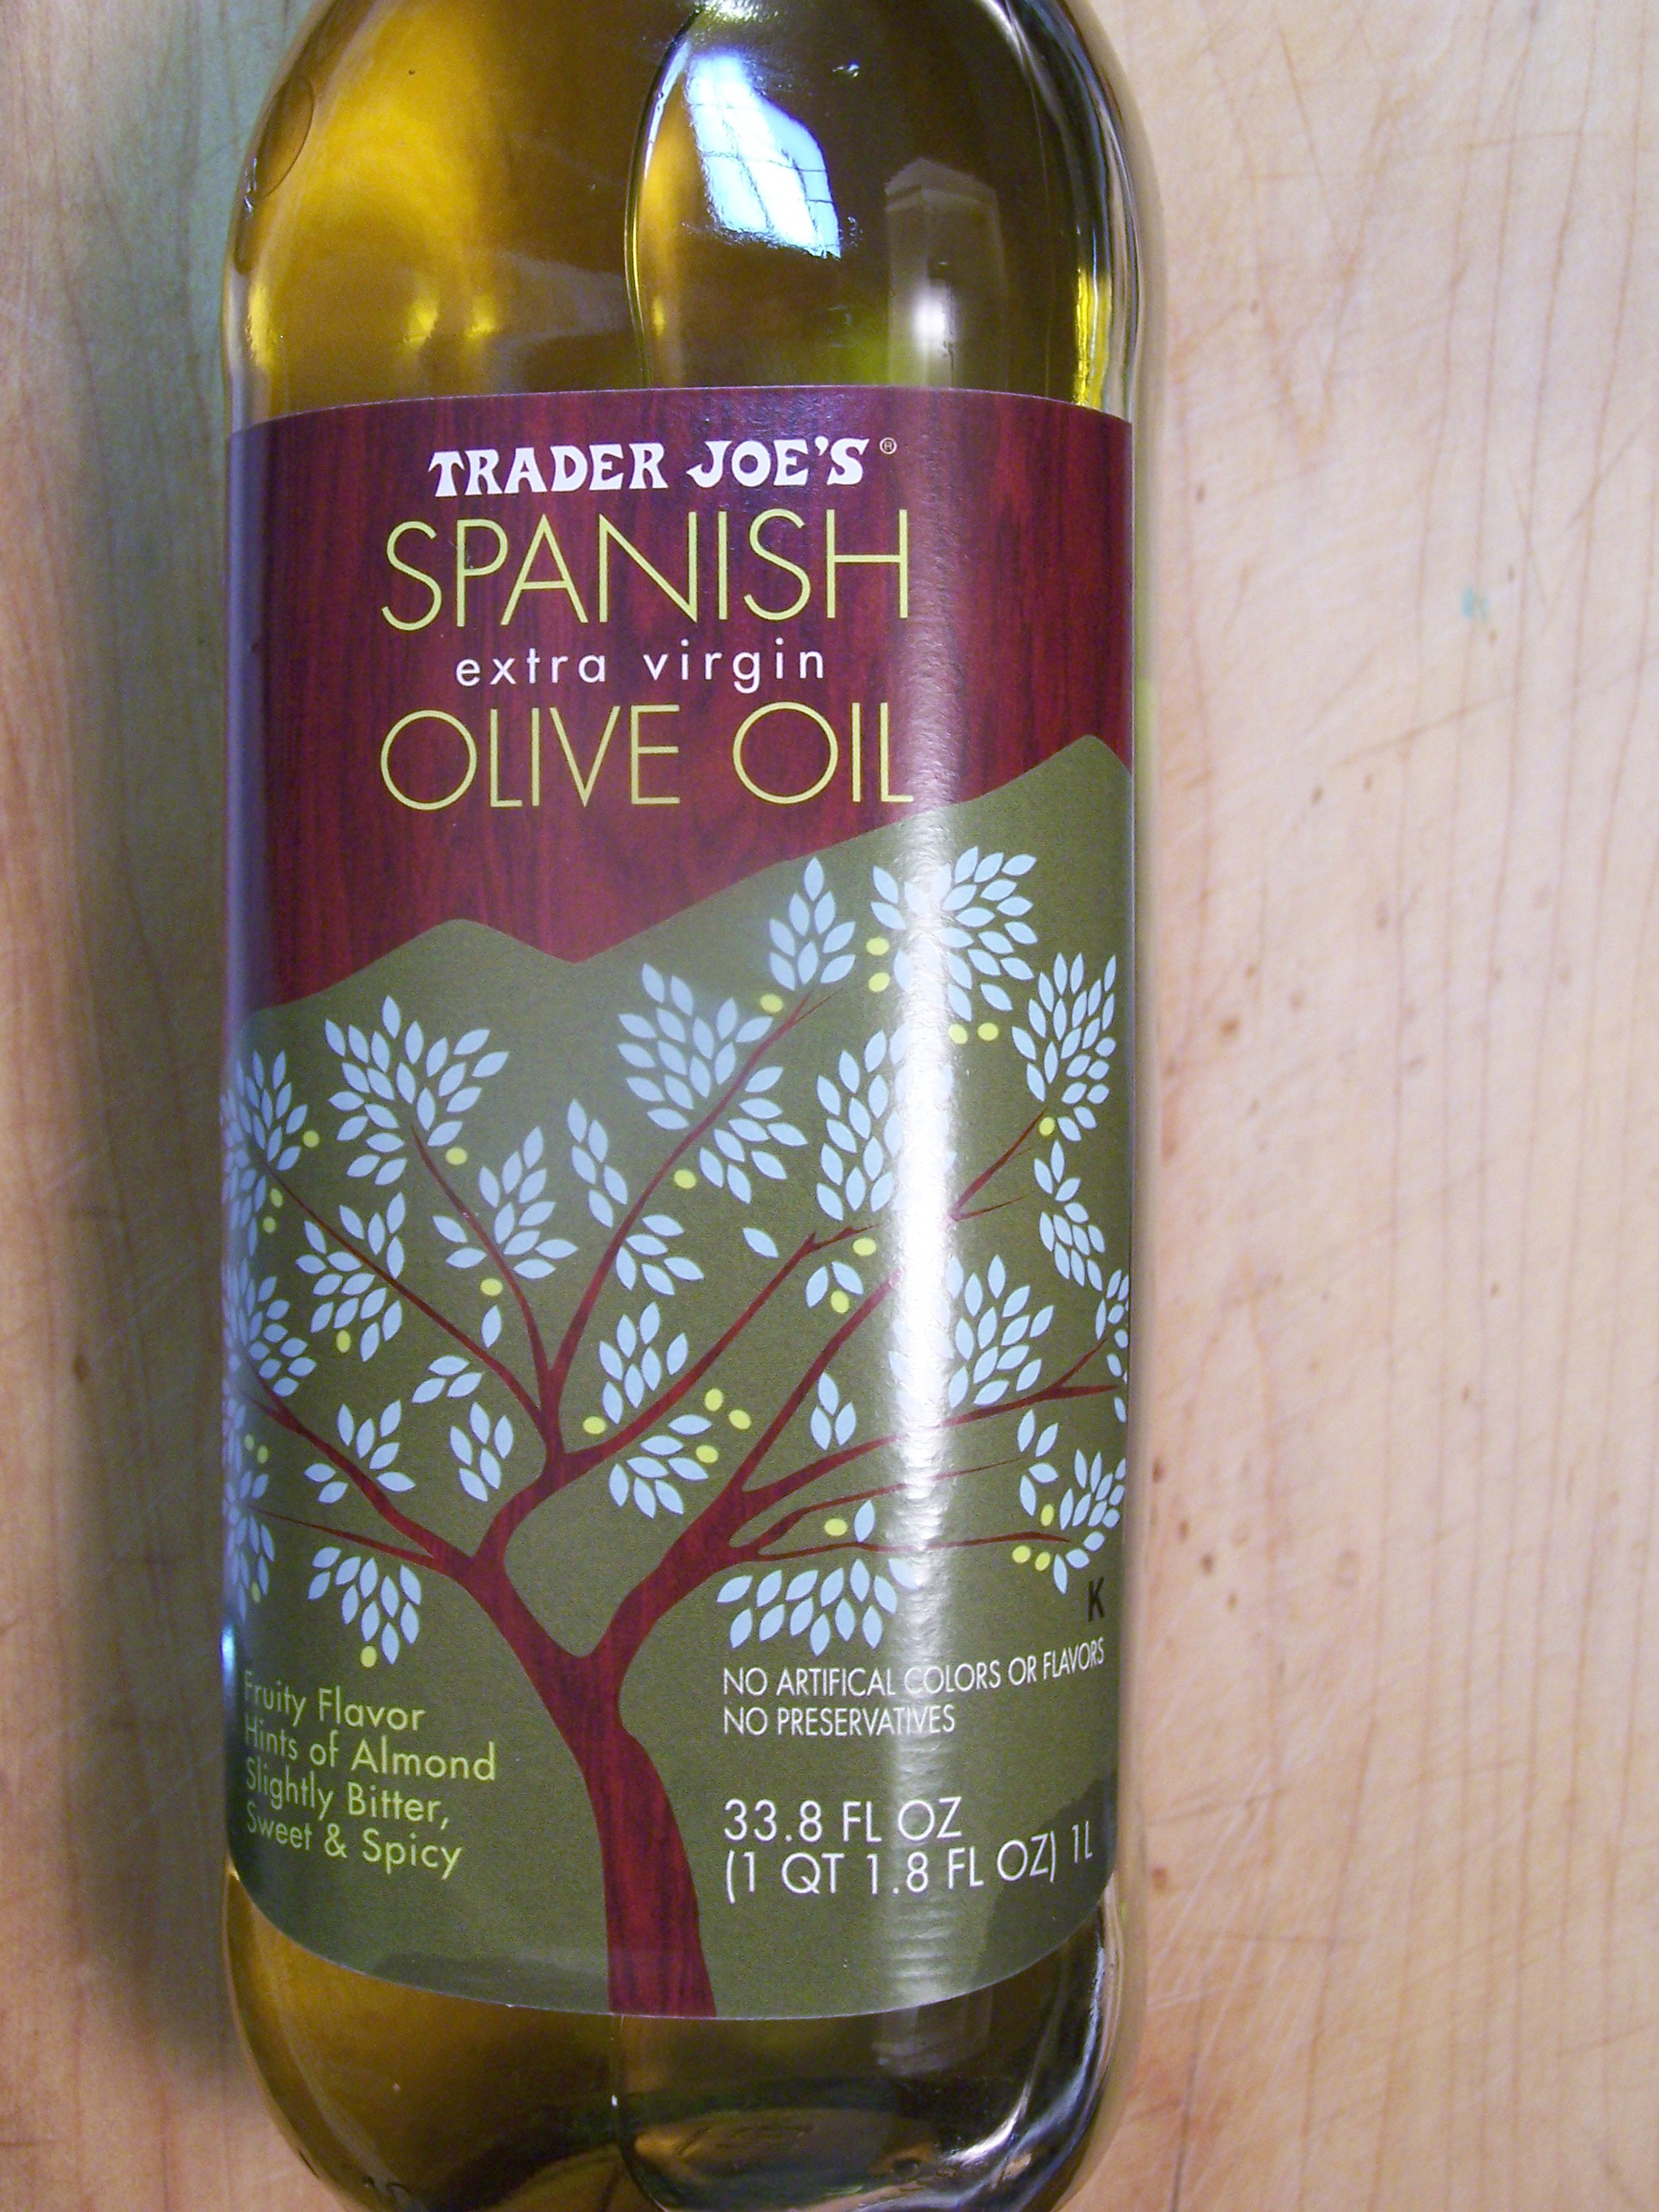 Trader joe s spanish extra virgin olive oil food review for Trader joe s fish oil